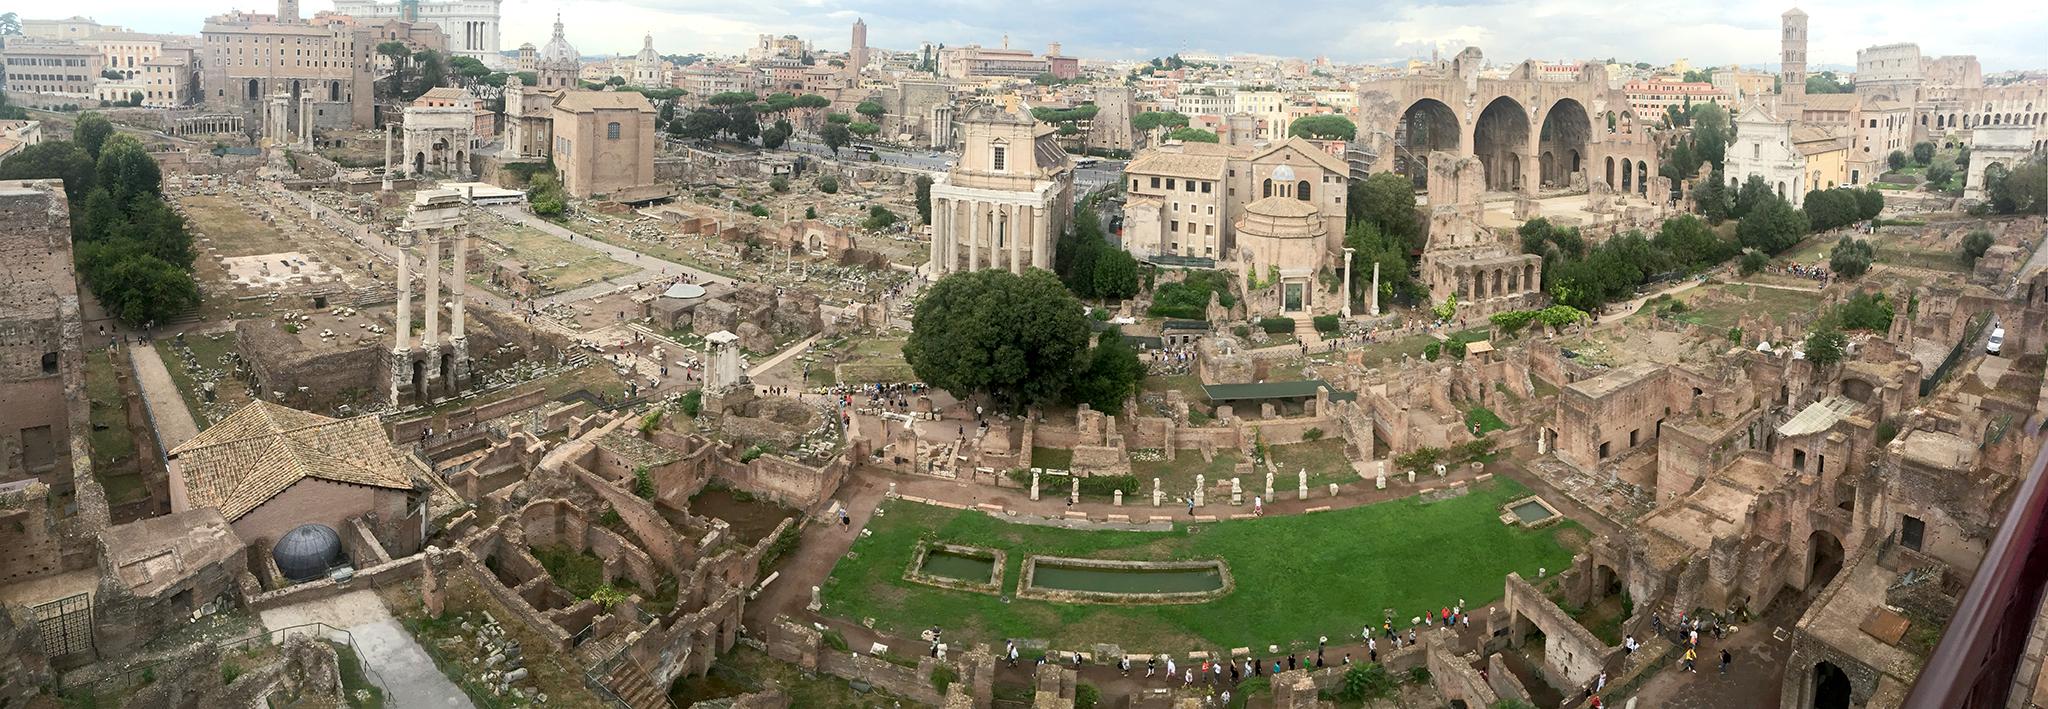 Roman_Forum_from_Palatine_Hill